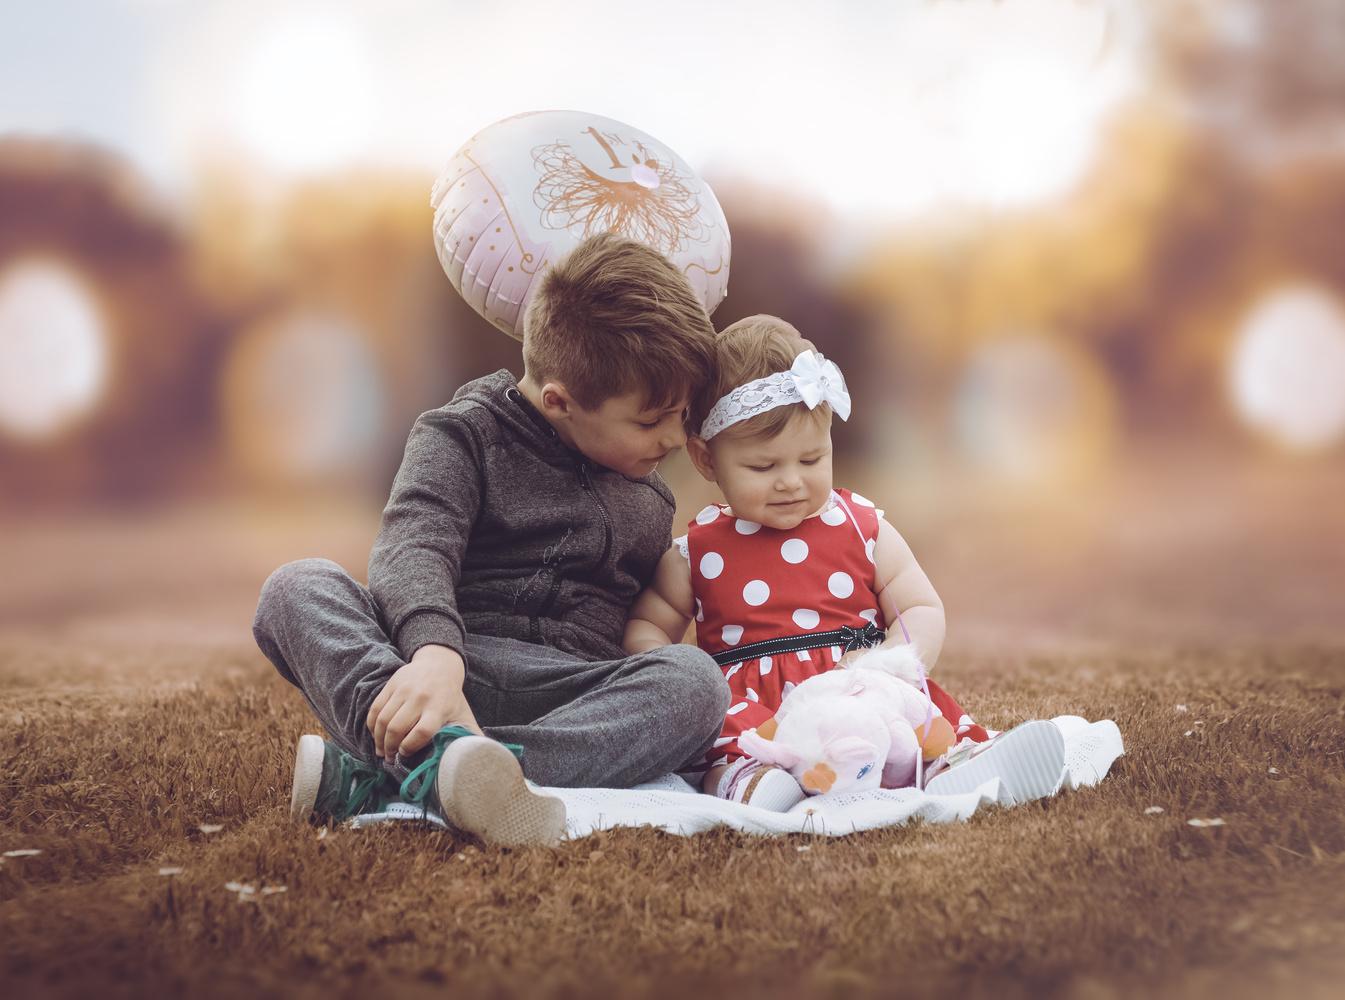 happy childhood  by Neringa olbutaite